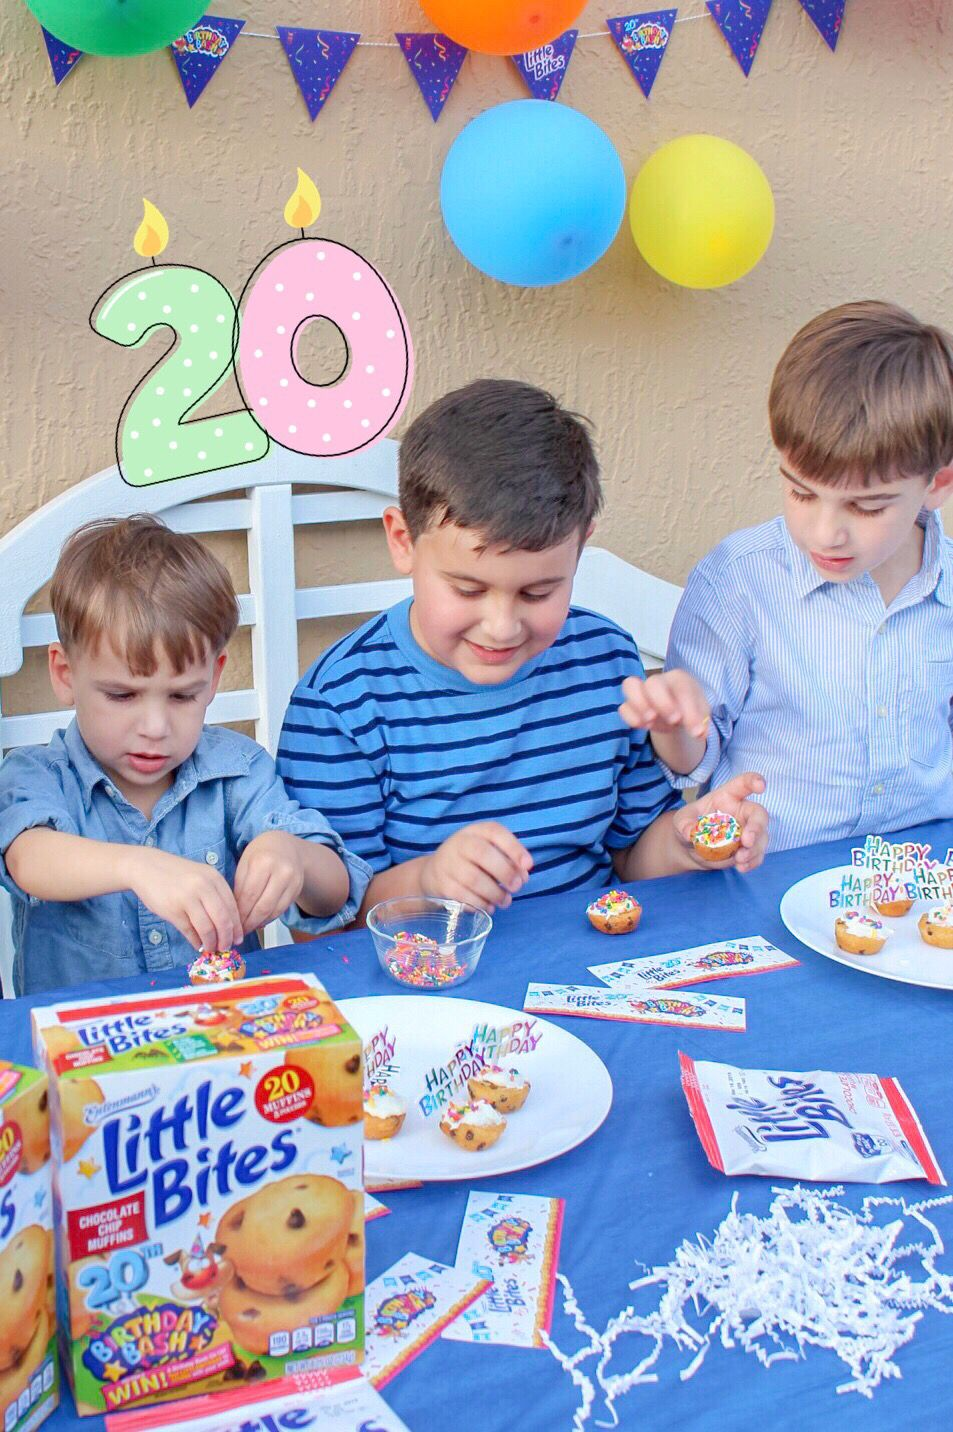 Celebrate with little bites snacks little bites 20th